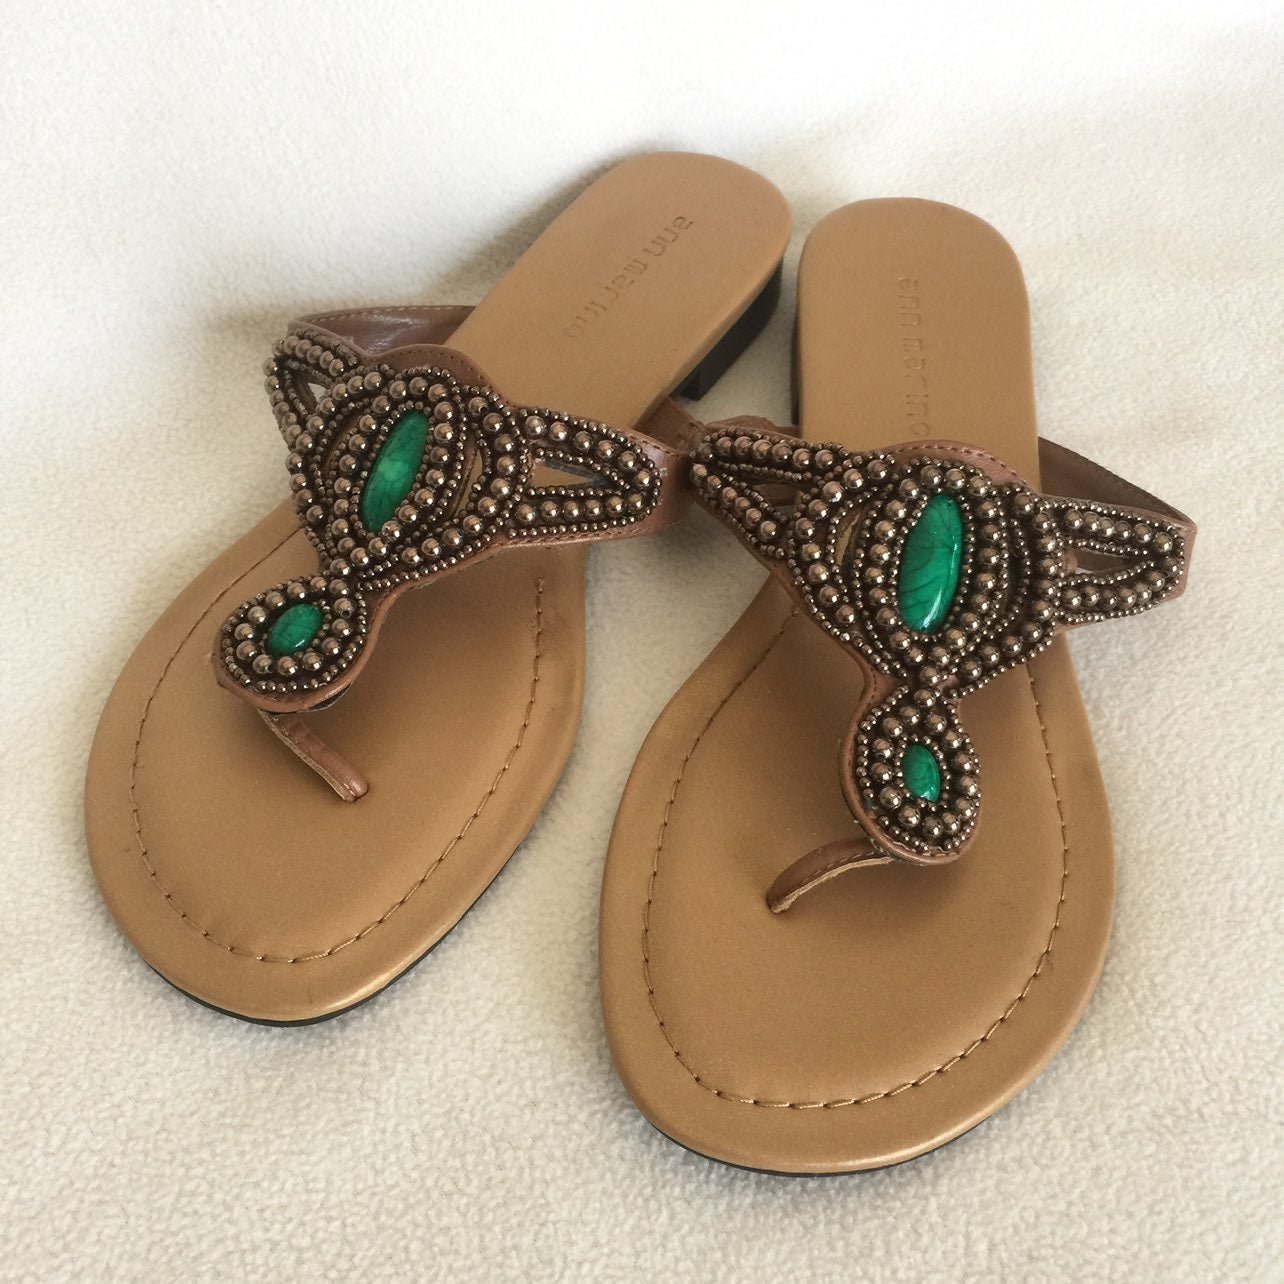 NWOT Ann Marino Sandals/Flip-flops